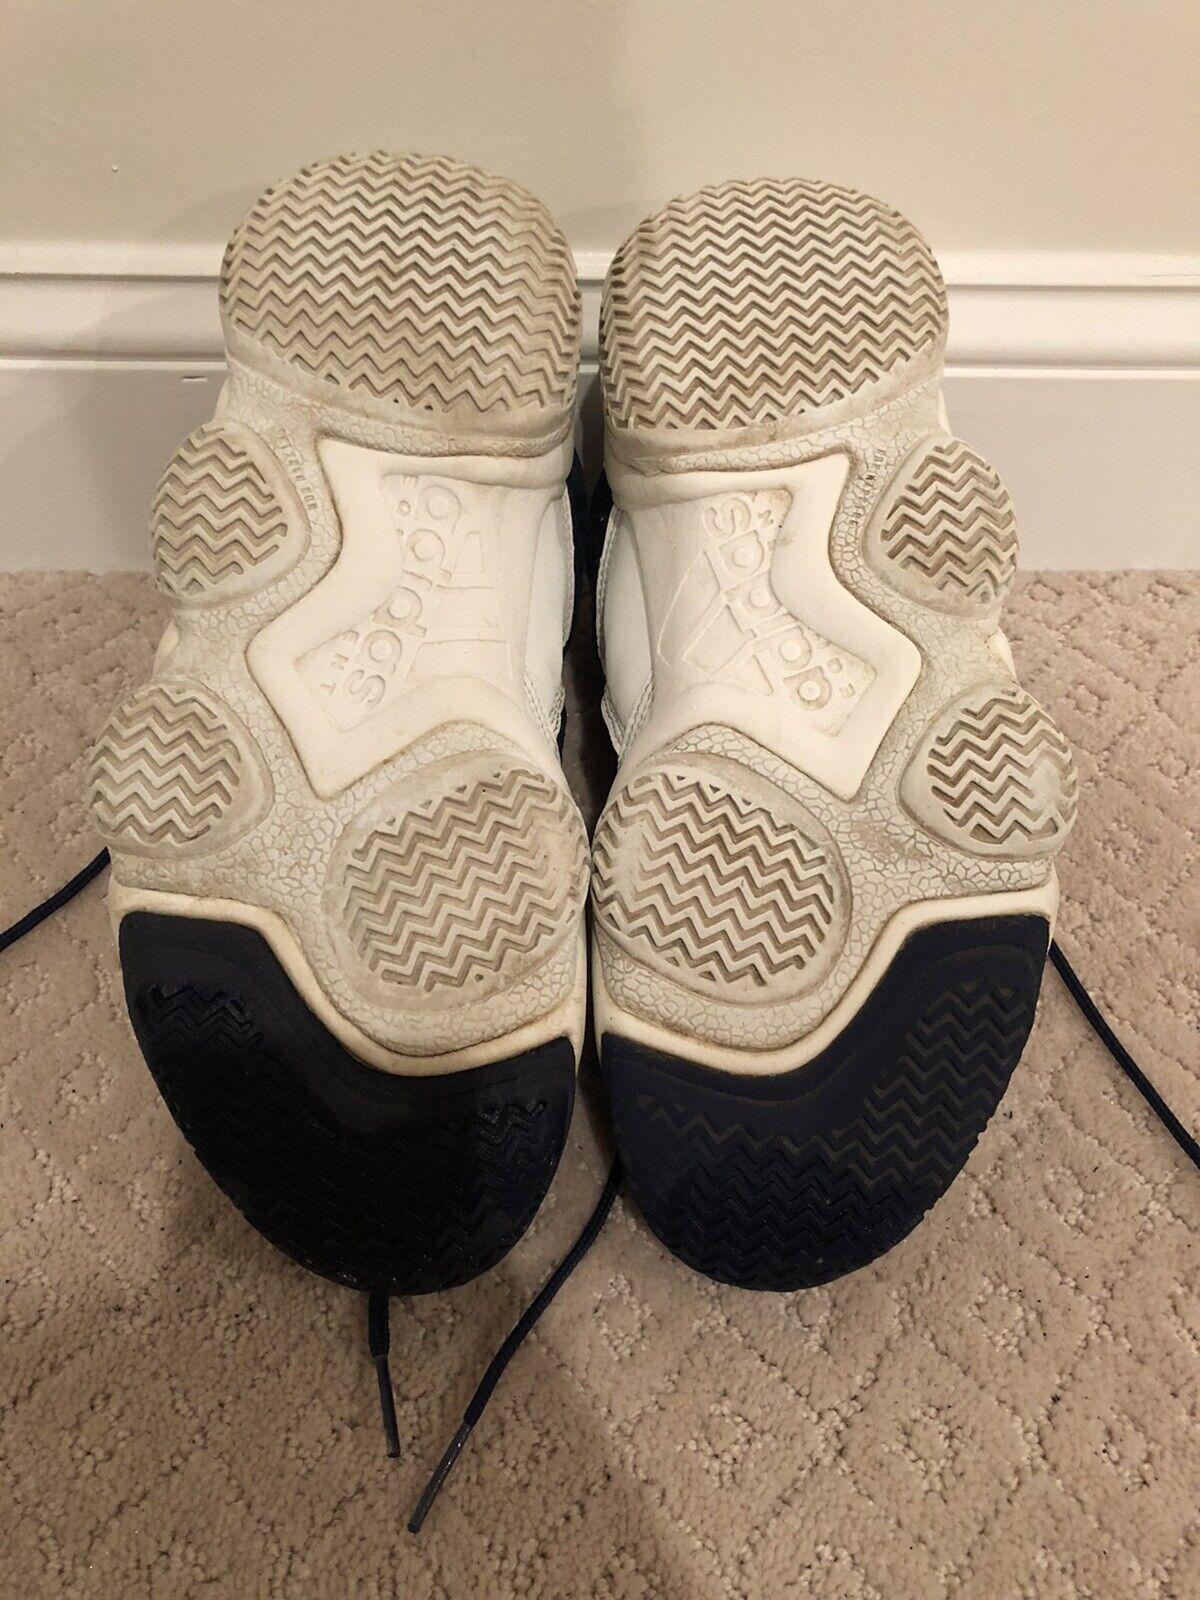 Kobe Bryant Adidas Sneakers. - image 5